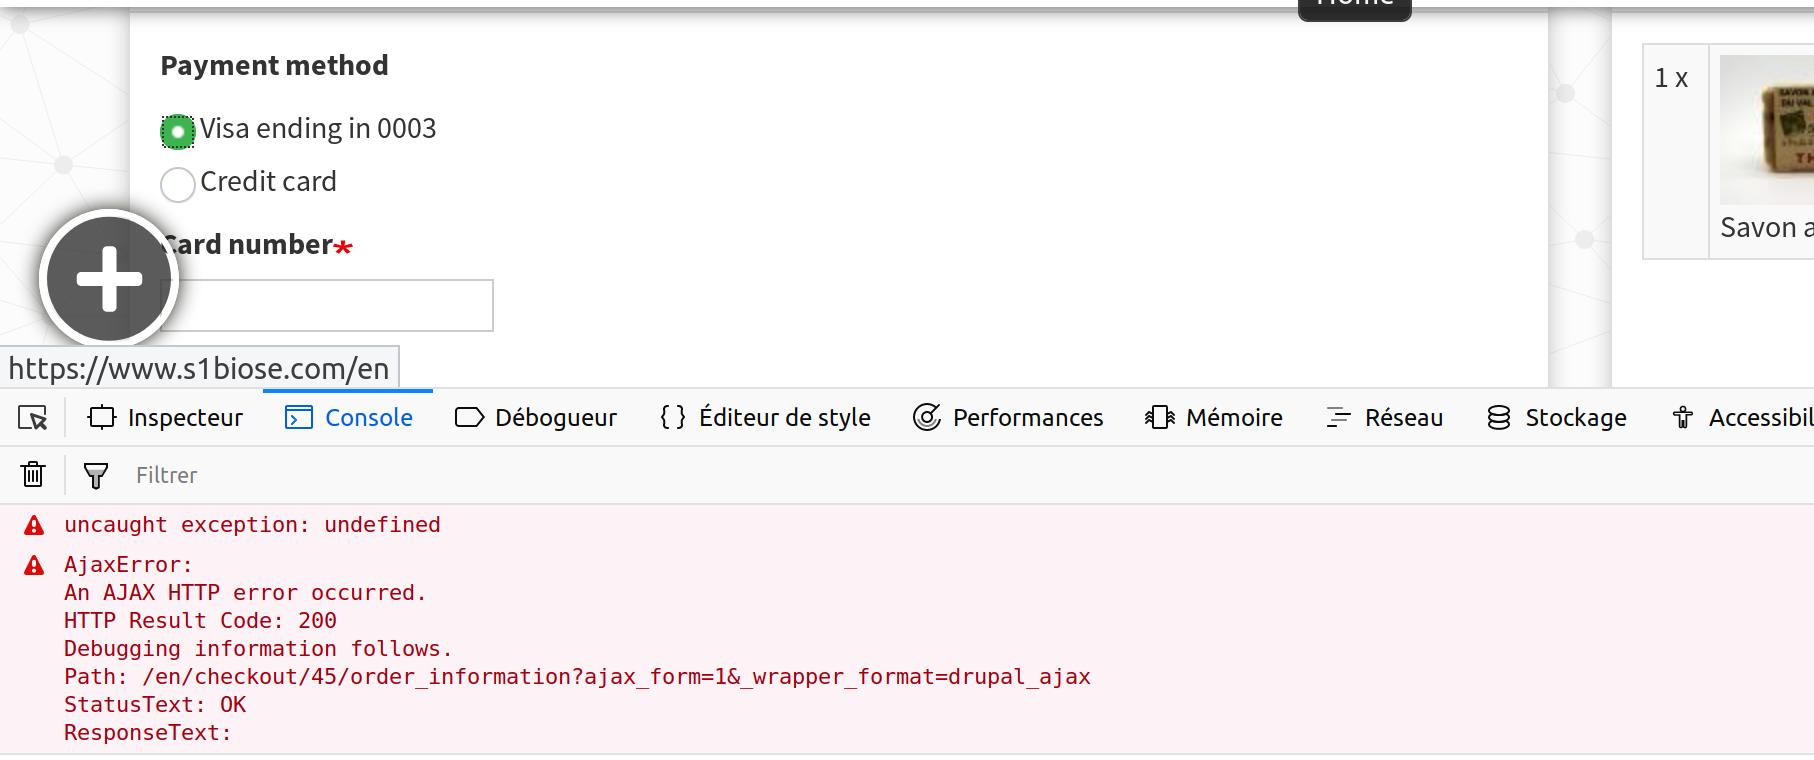 Ajax error when I change the payment method [#3027489